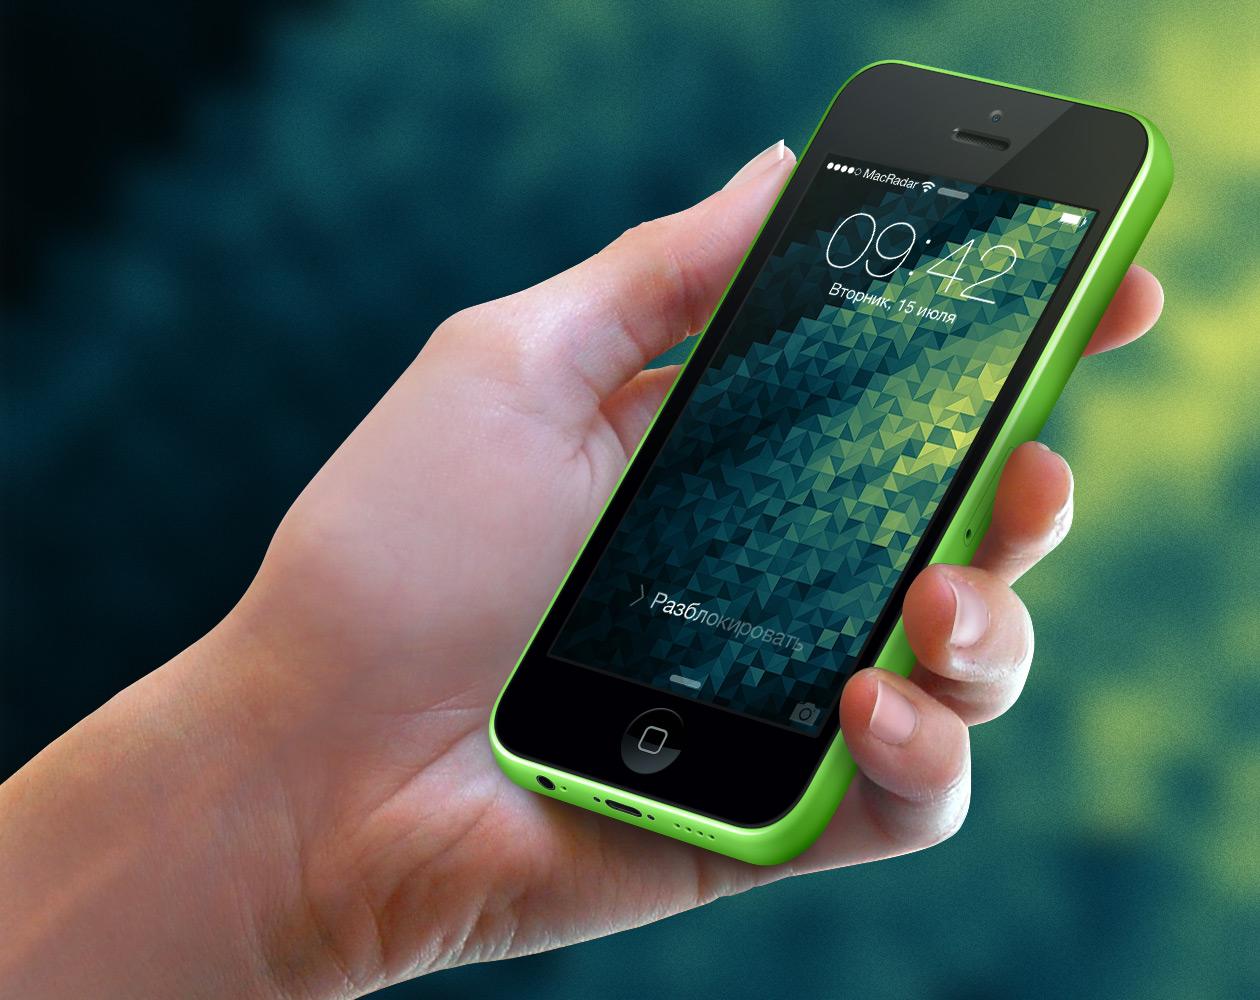 Обои для iPhone: Евклидова геометрика